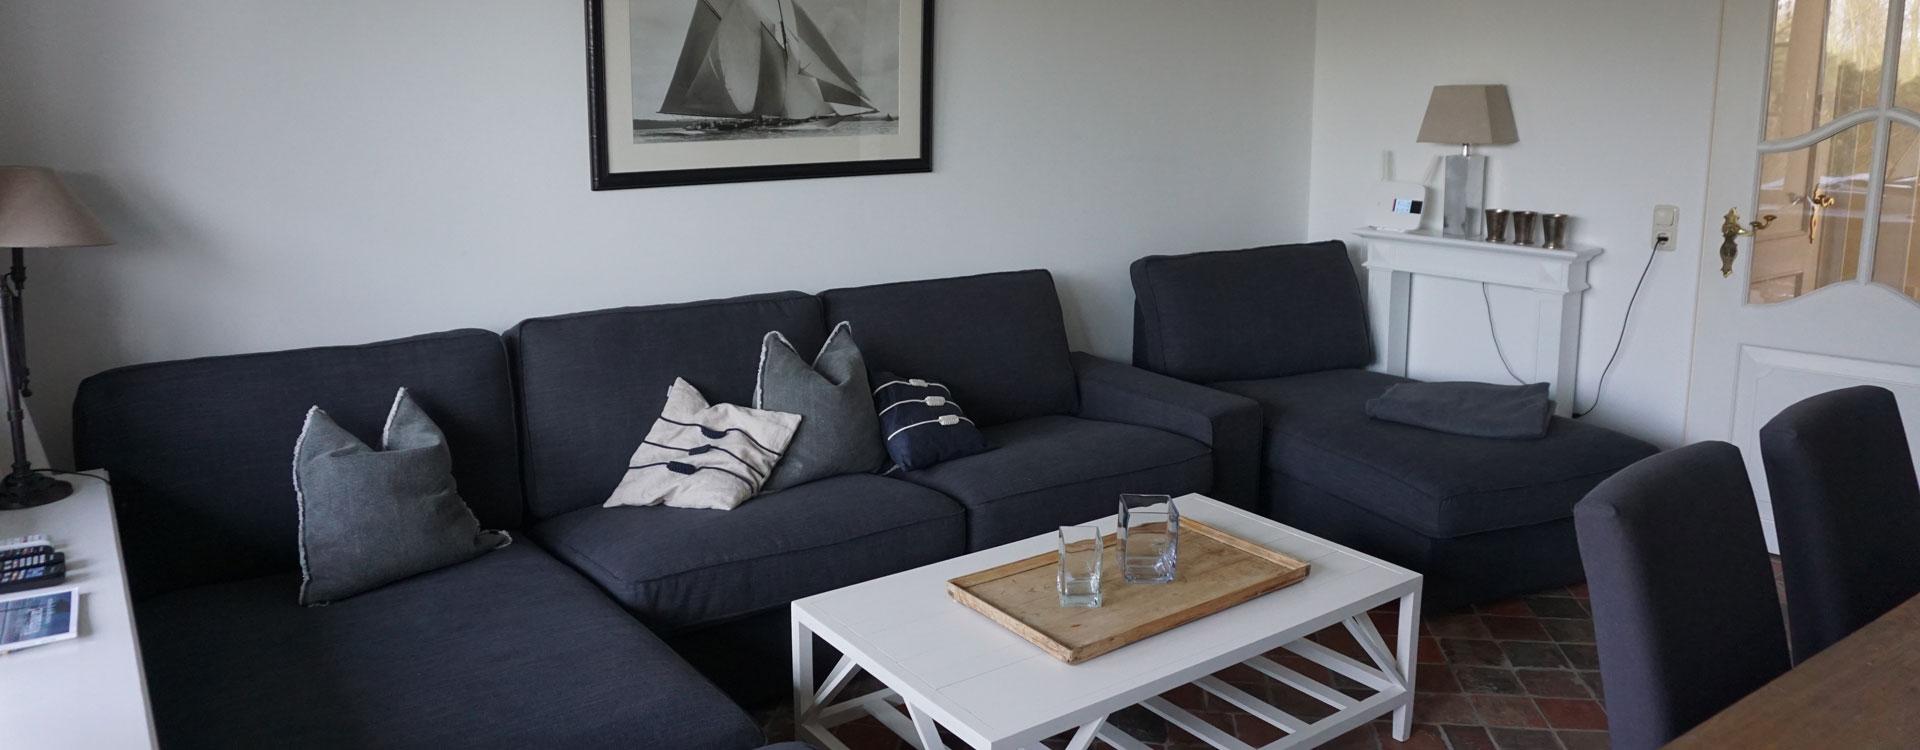 Wohnraum im Sylthaus (2)